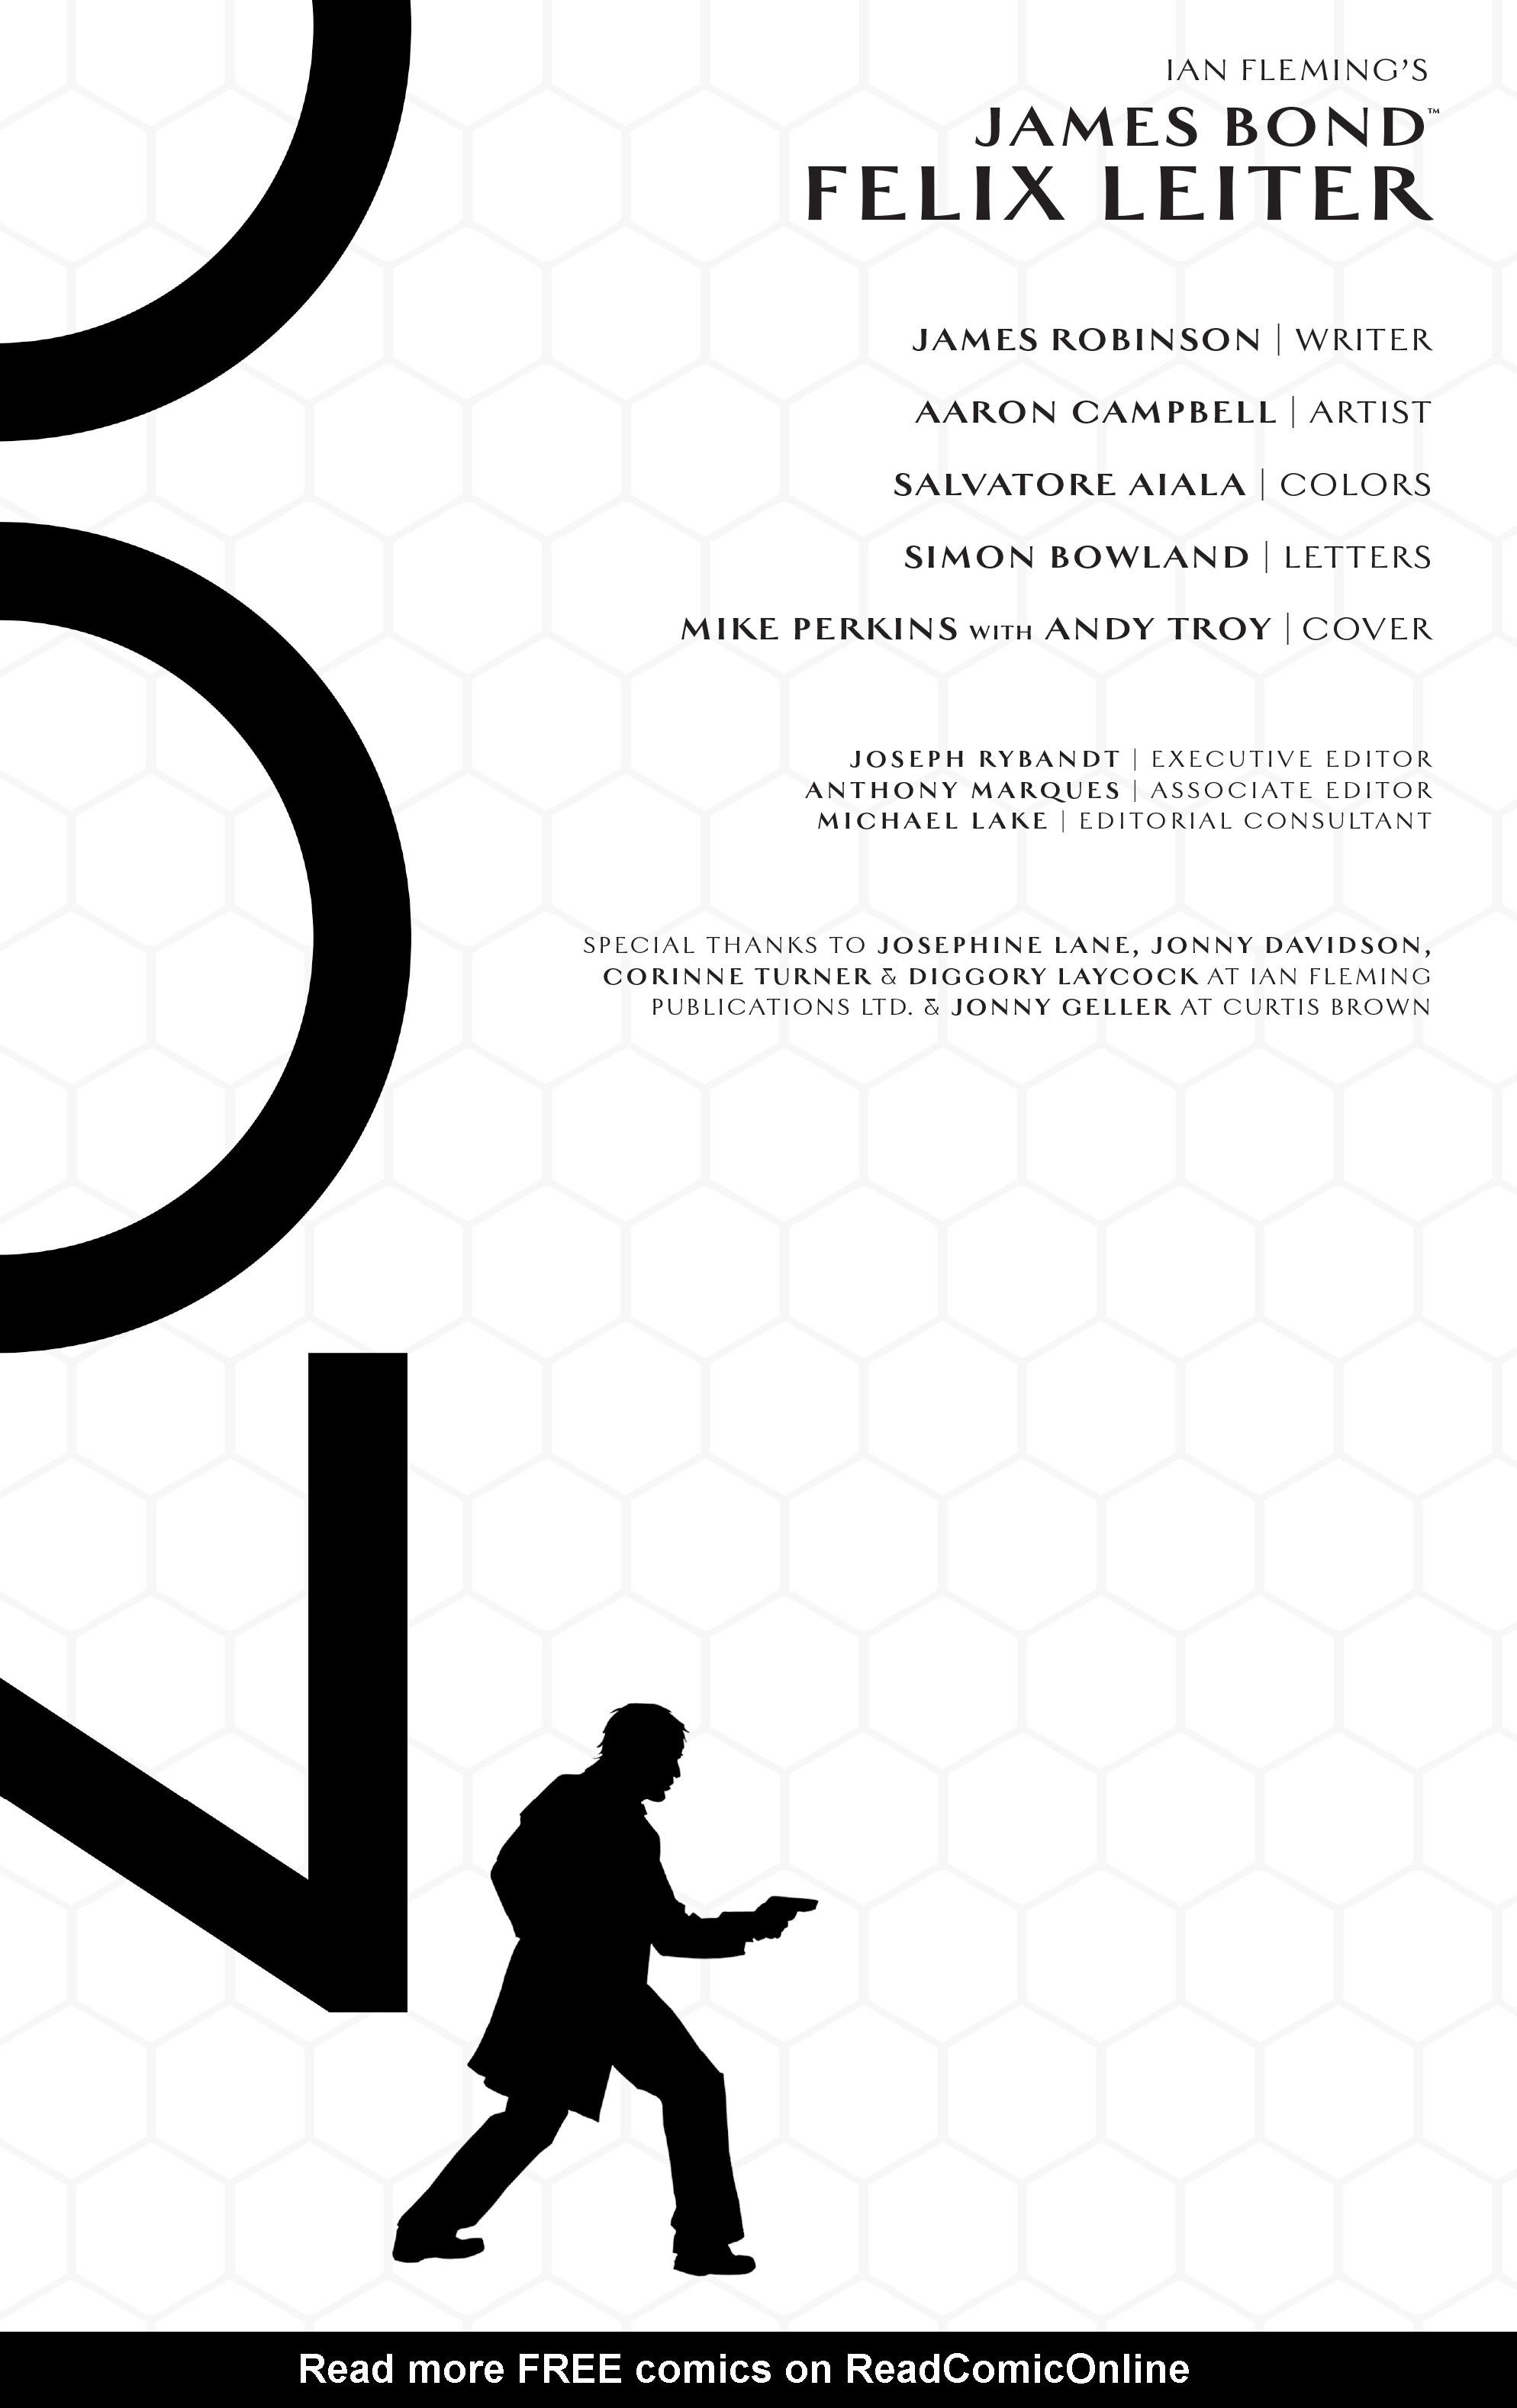 Read online James Bond: Felix Leiter comic -  Issue #6 - 2